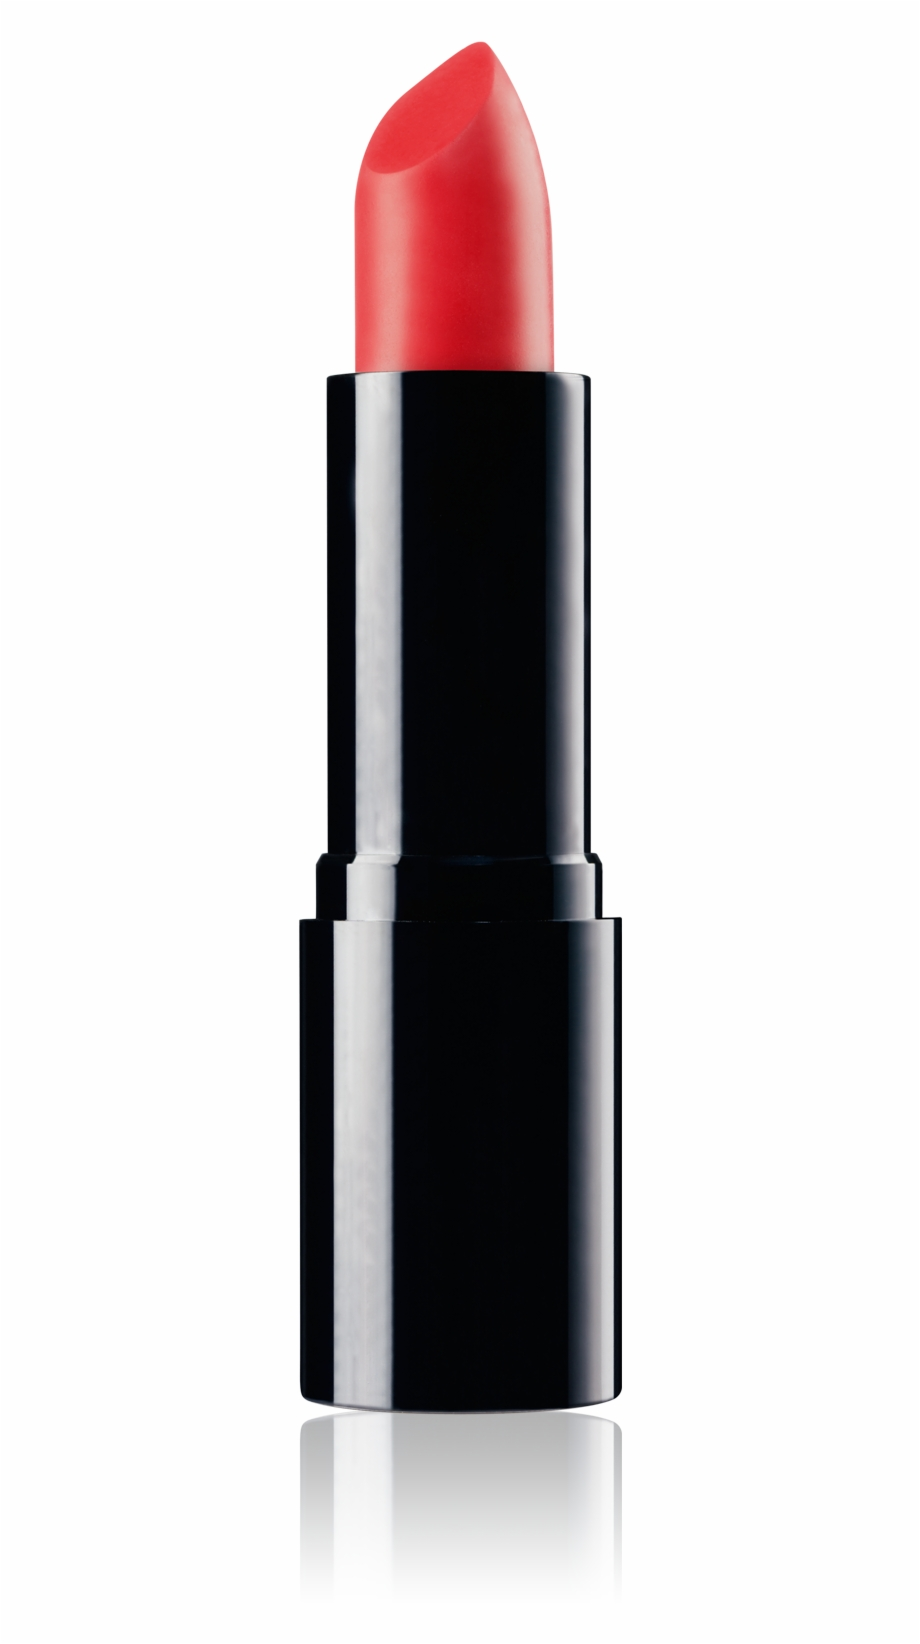 lipstick clipart liquid lipstick